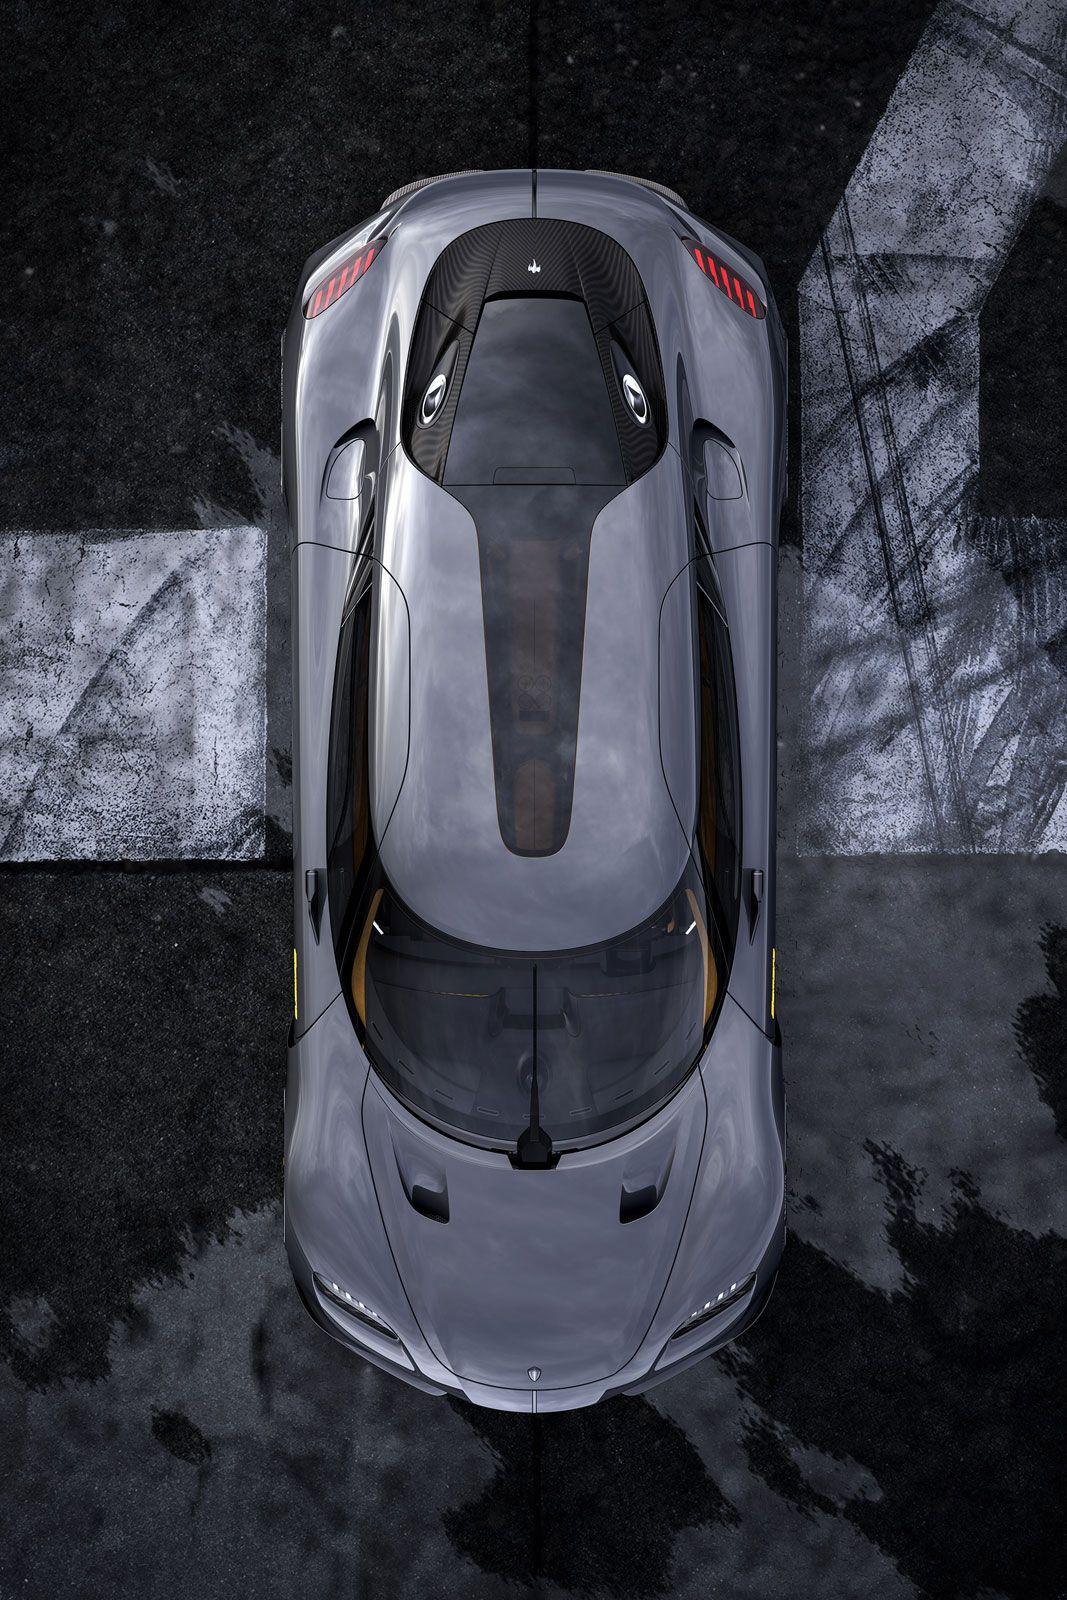 Koenigsegg Gemera is a 400 km/h Mega-GT  #koenigsegg #gims2020 #supercars #cardesign #automotivedesign #autodesign #cardesignworld #cardesignercommunity #cardesignpro #carbodydesign #cardesigner #vehicledesign #luxurycars #dreamcar #supercar #hypercar #supercars